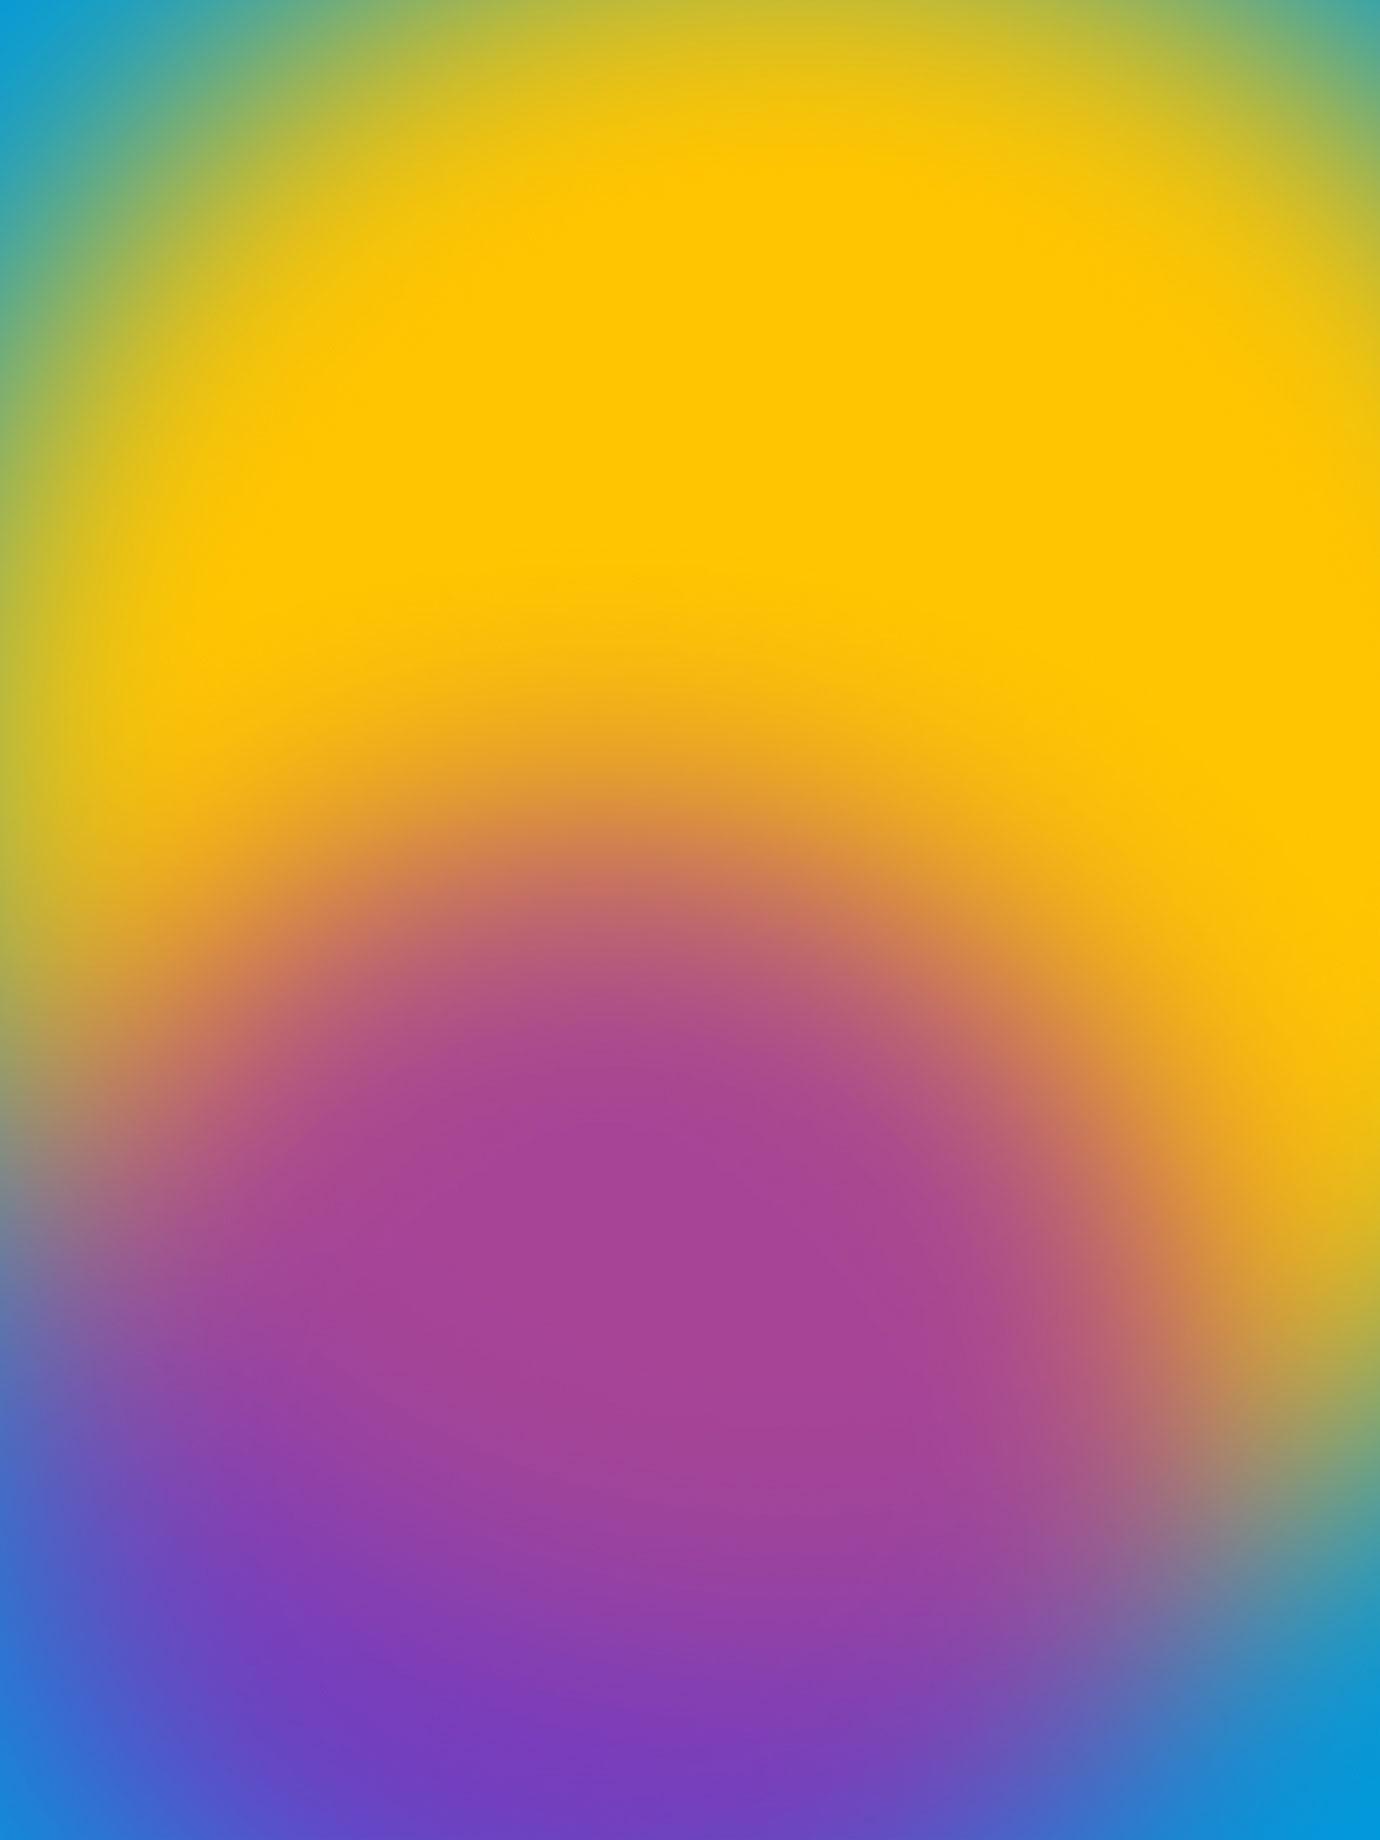 A colourful illustration.